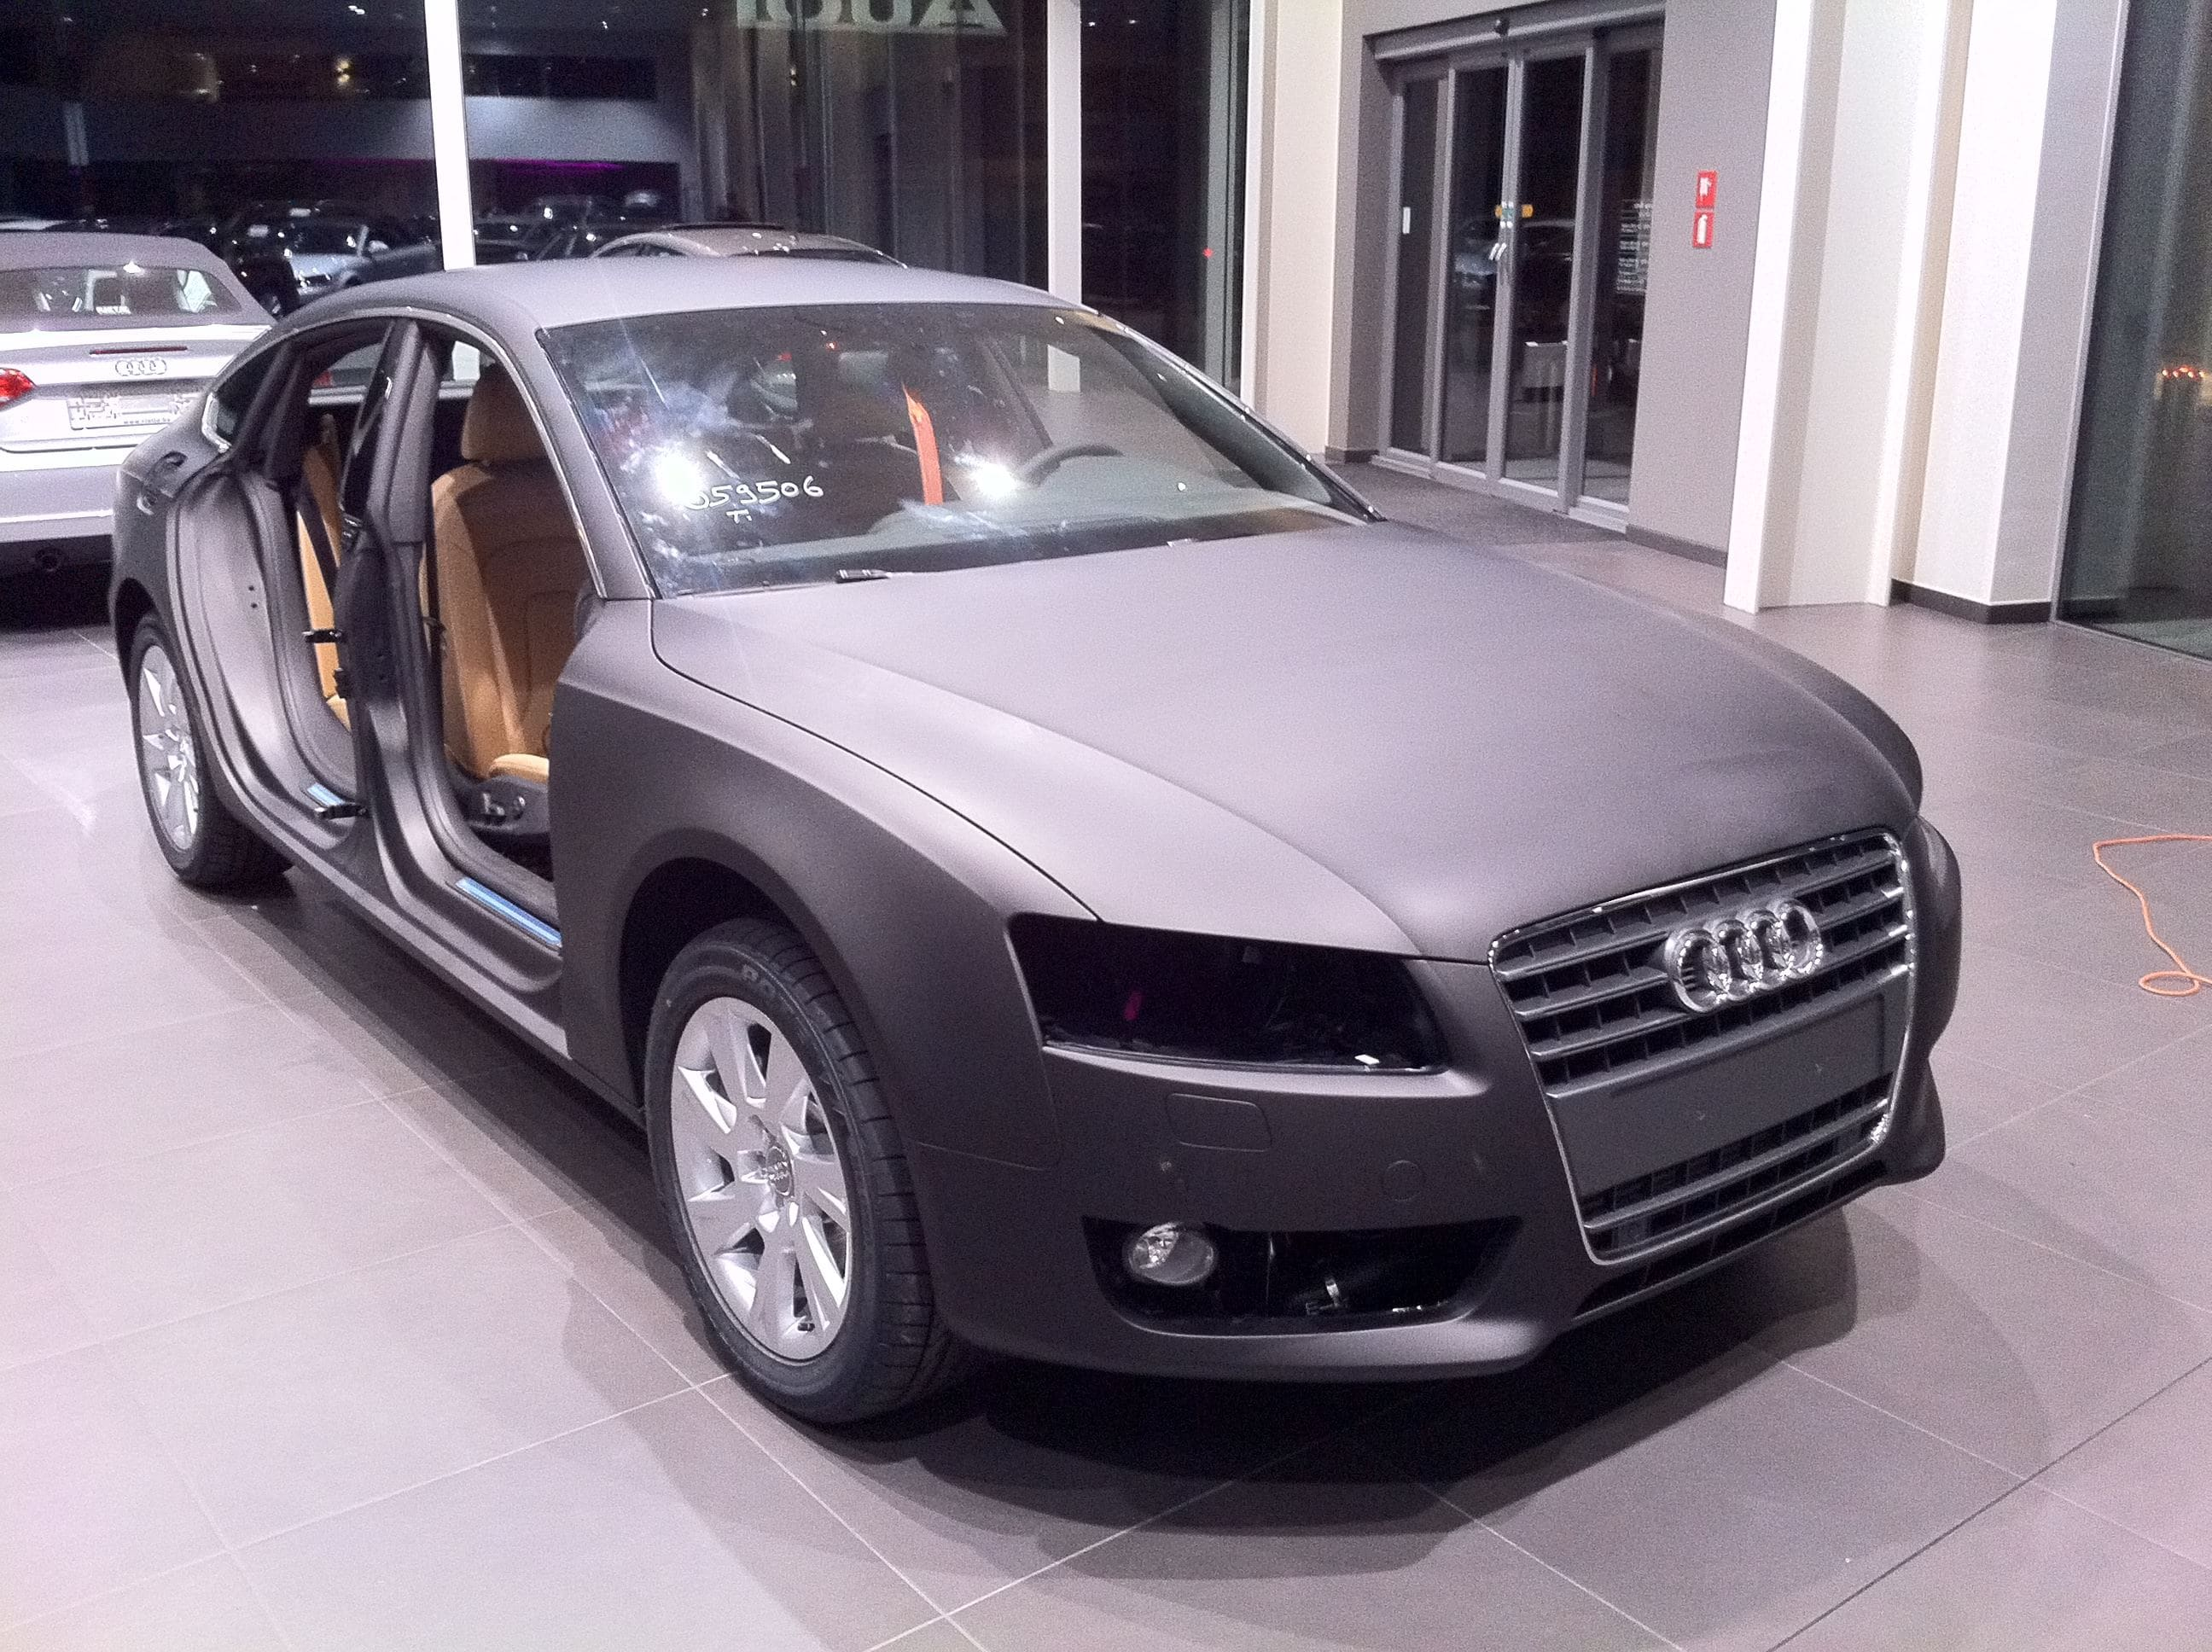 Audi A5 Sportback met Mat Grijze Wrap, Carwrapping door Wrapmyride.nu Foto-nr:4793, ©2021